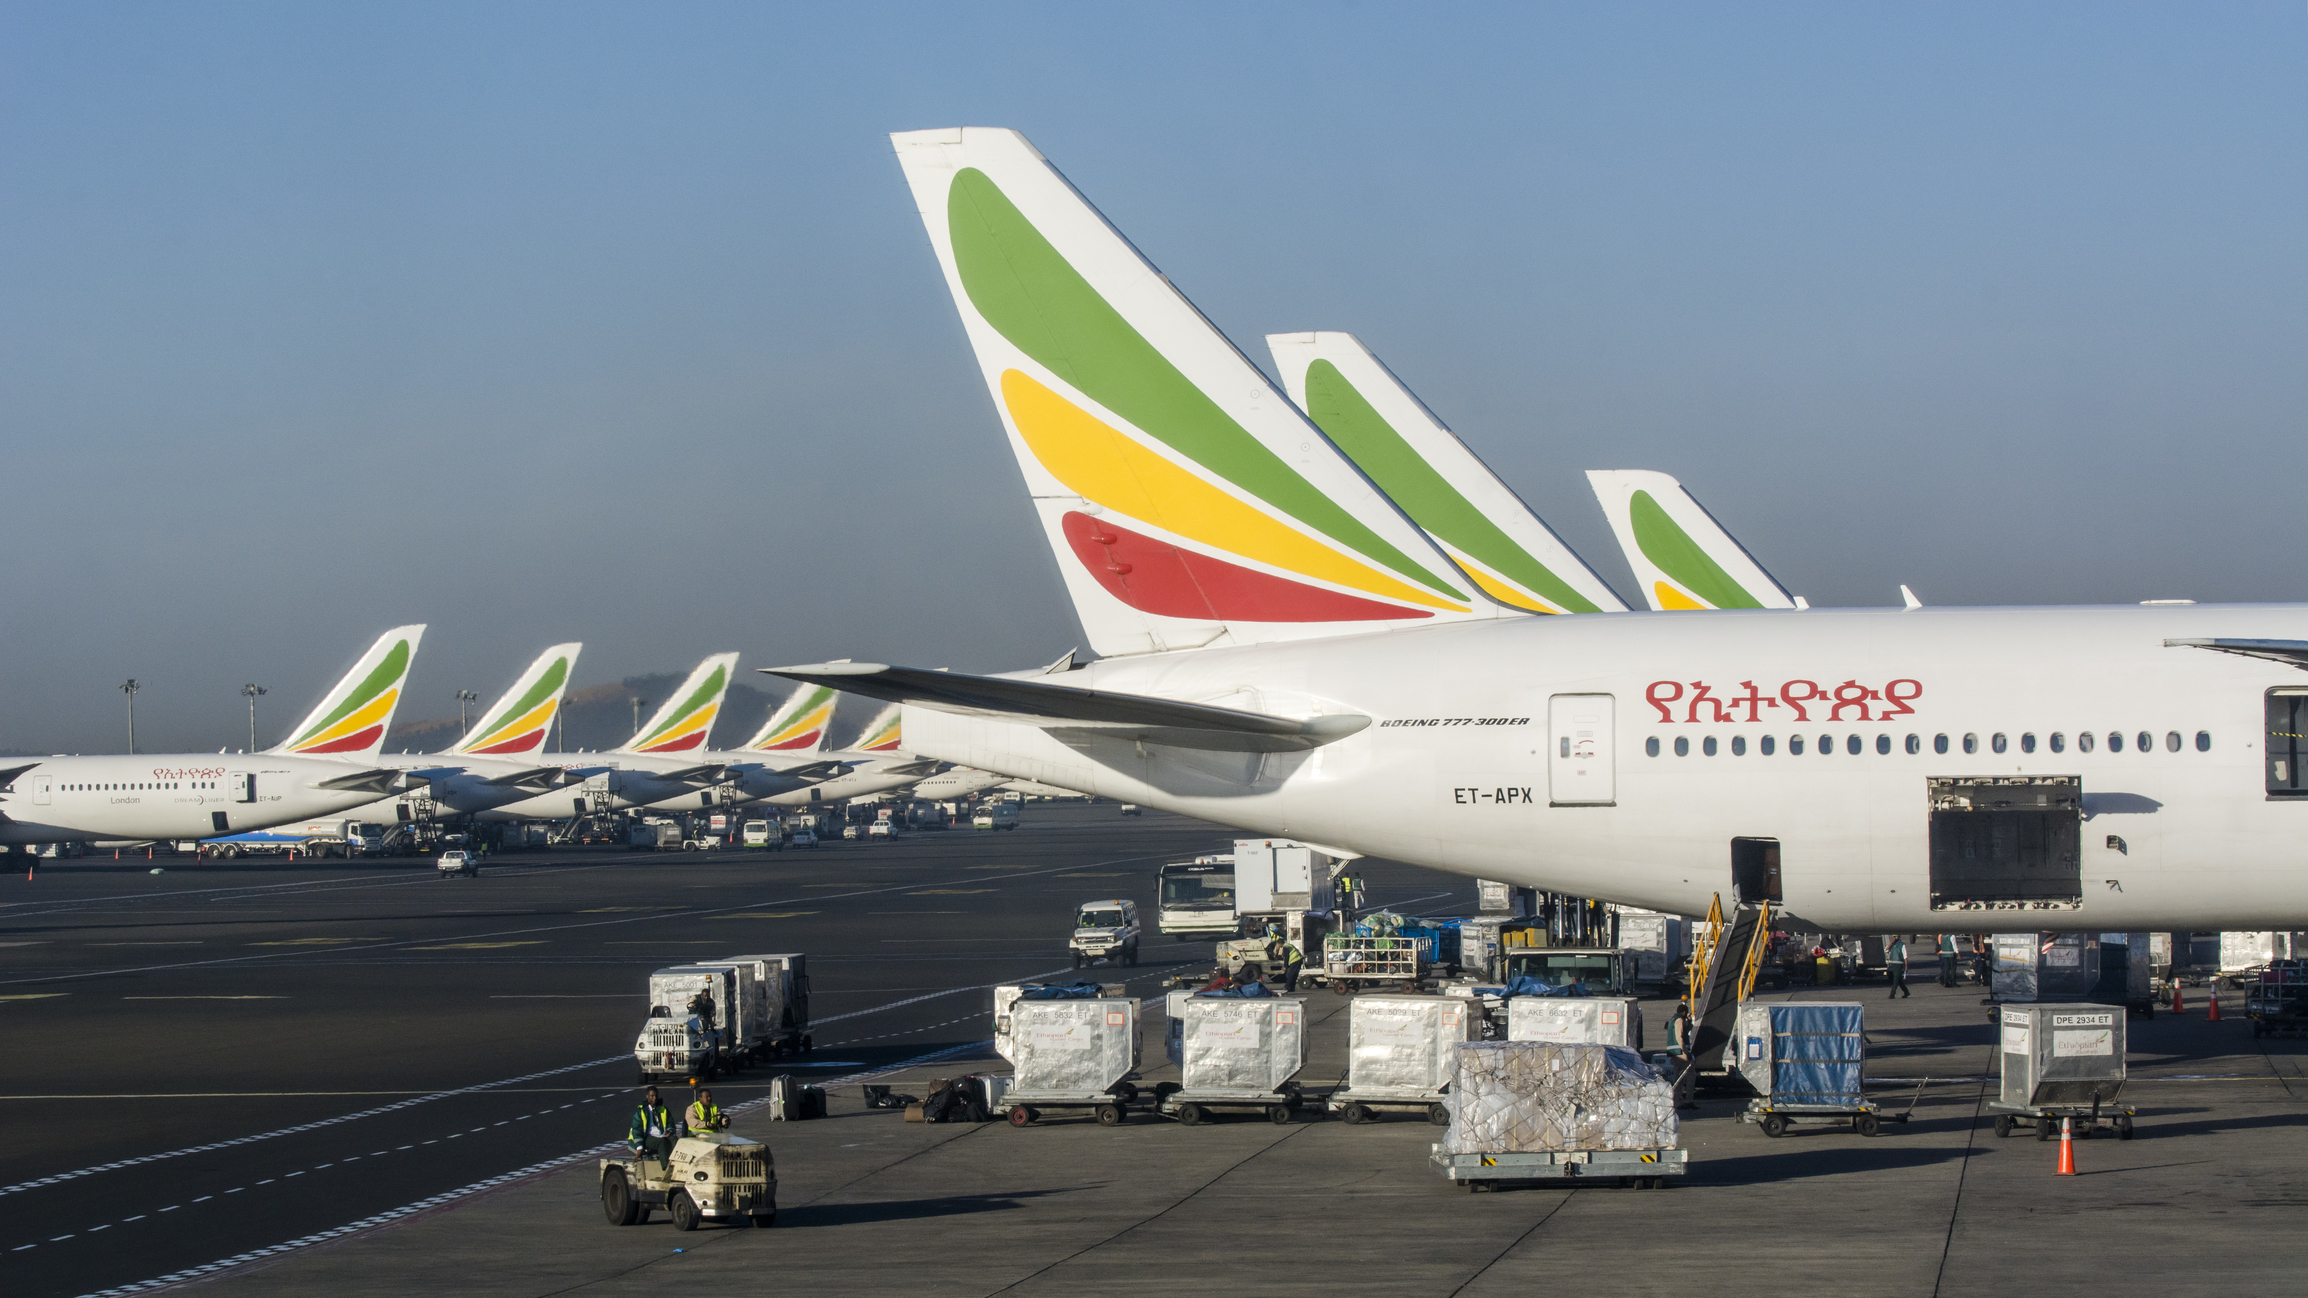 DHL the first global forwarder to establish a footprint in Ethiopia